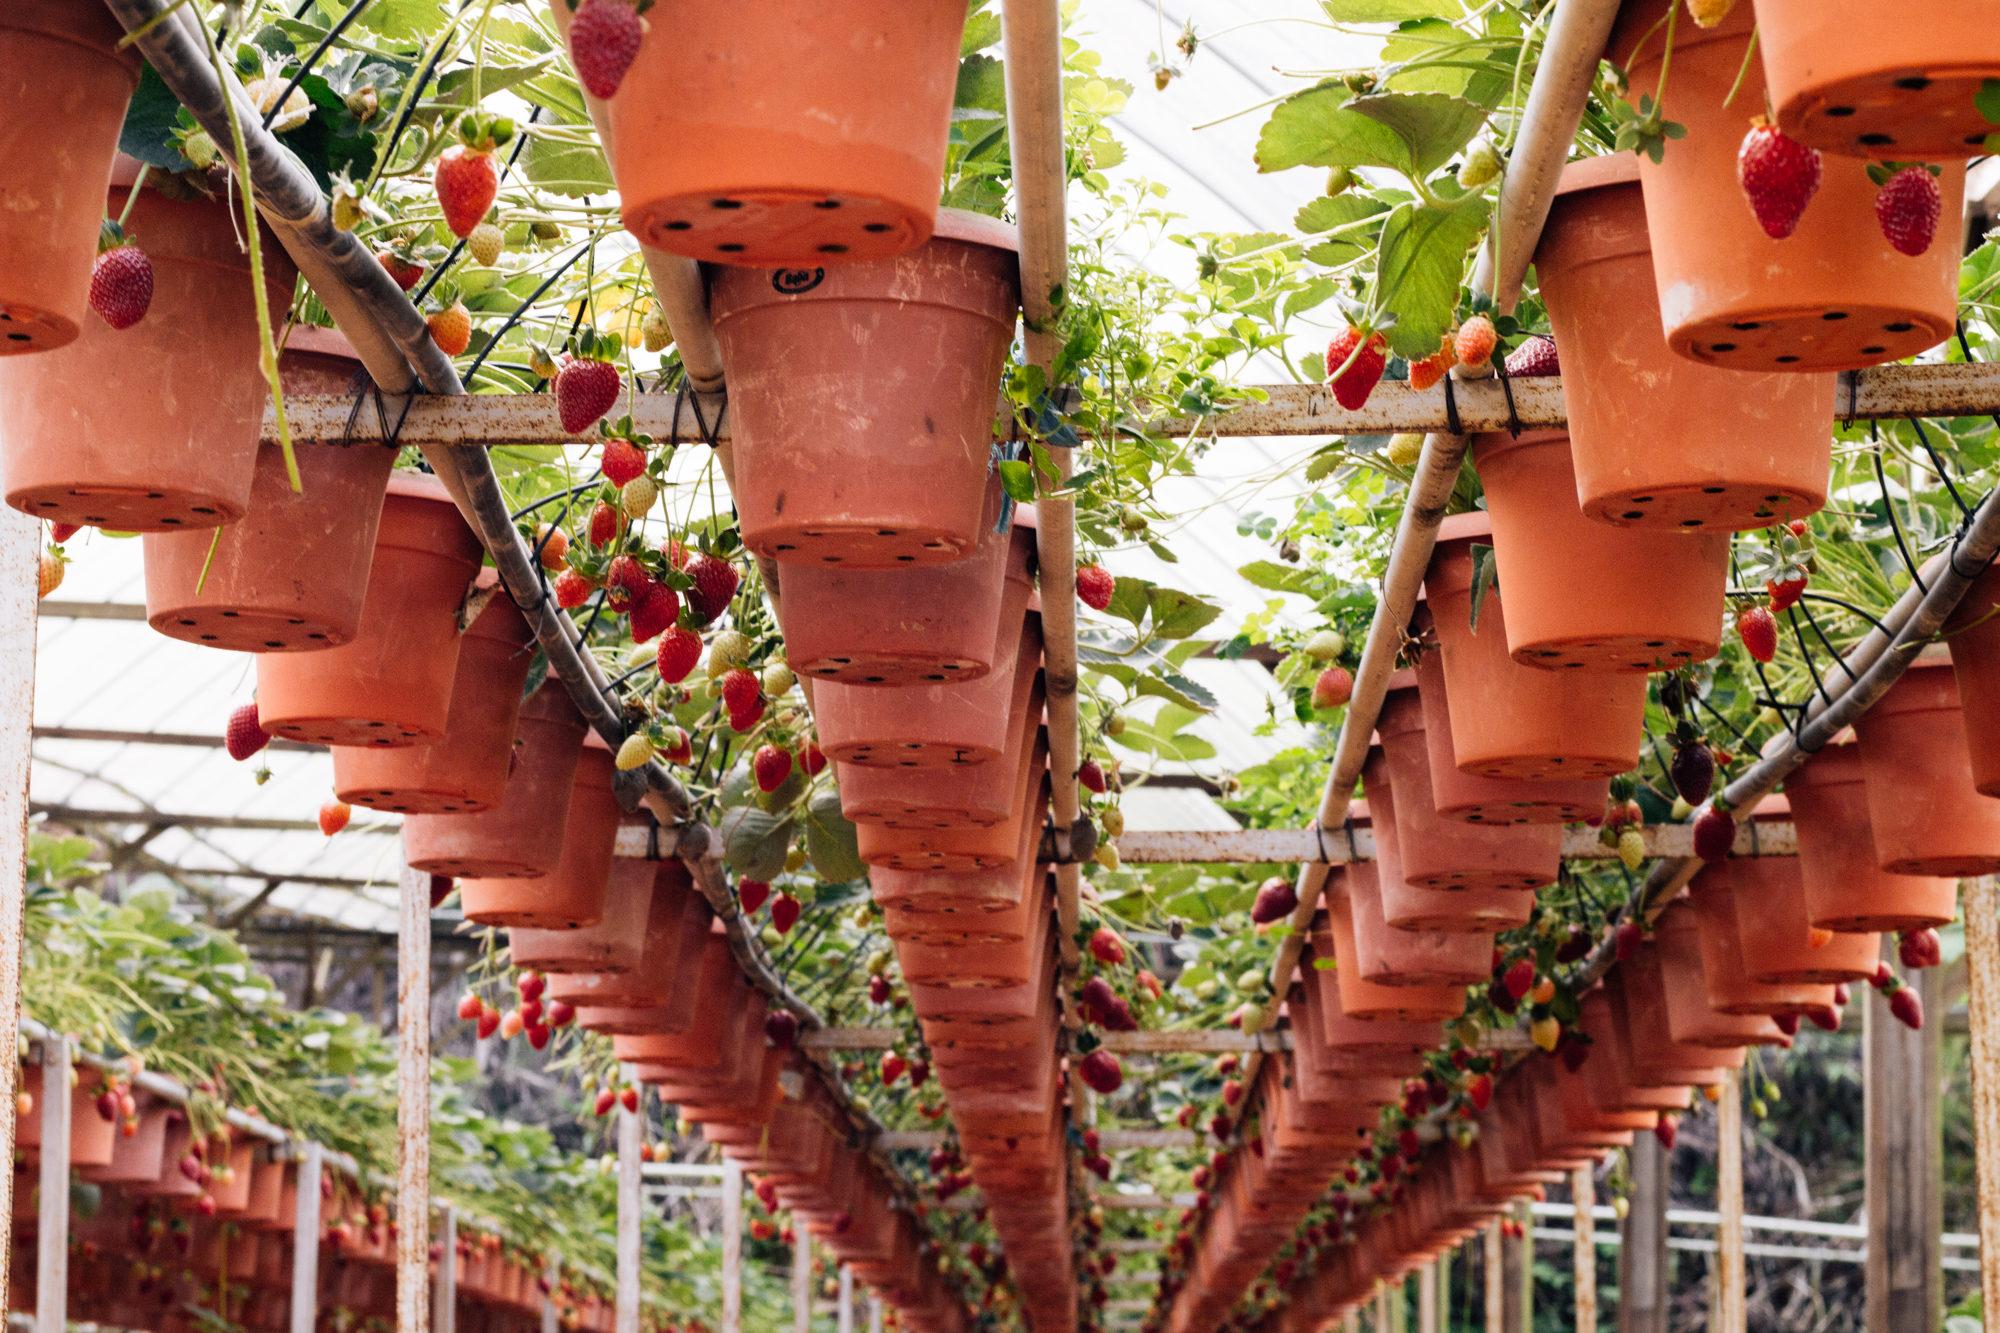 Strawberry farm, Cameron Highlands, Malaysia